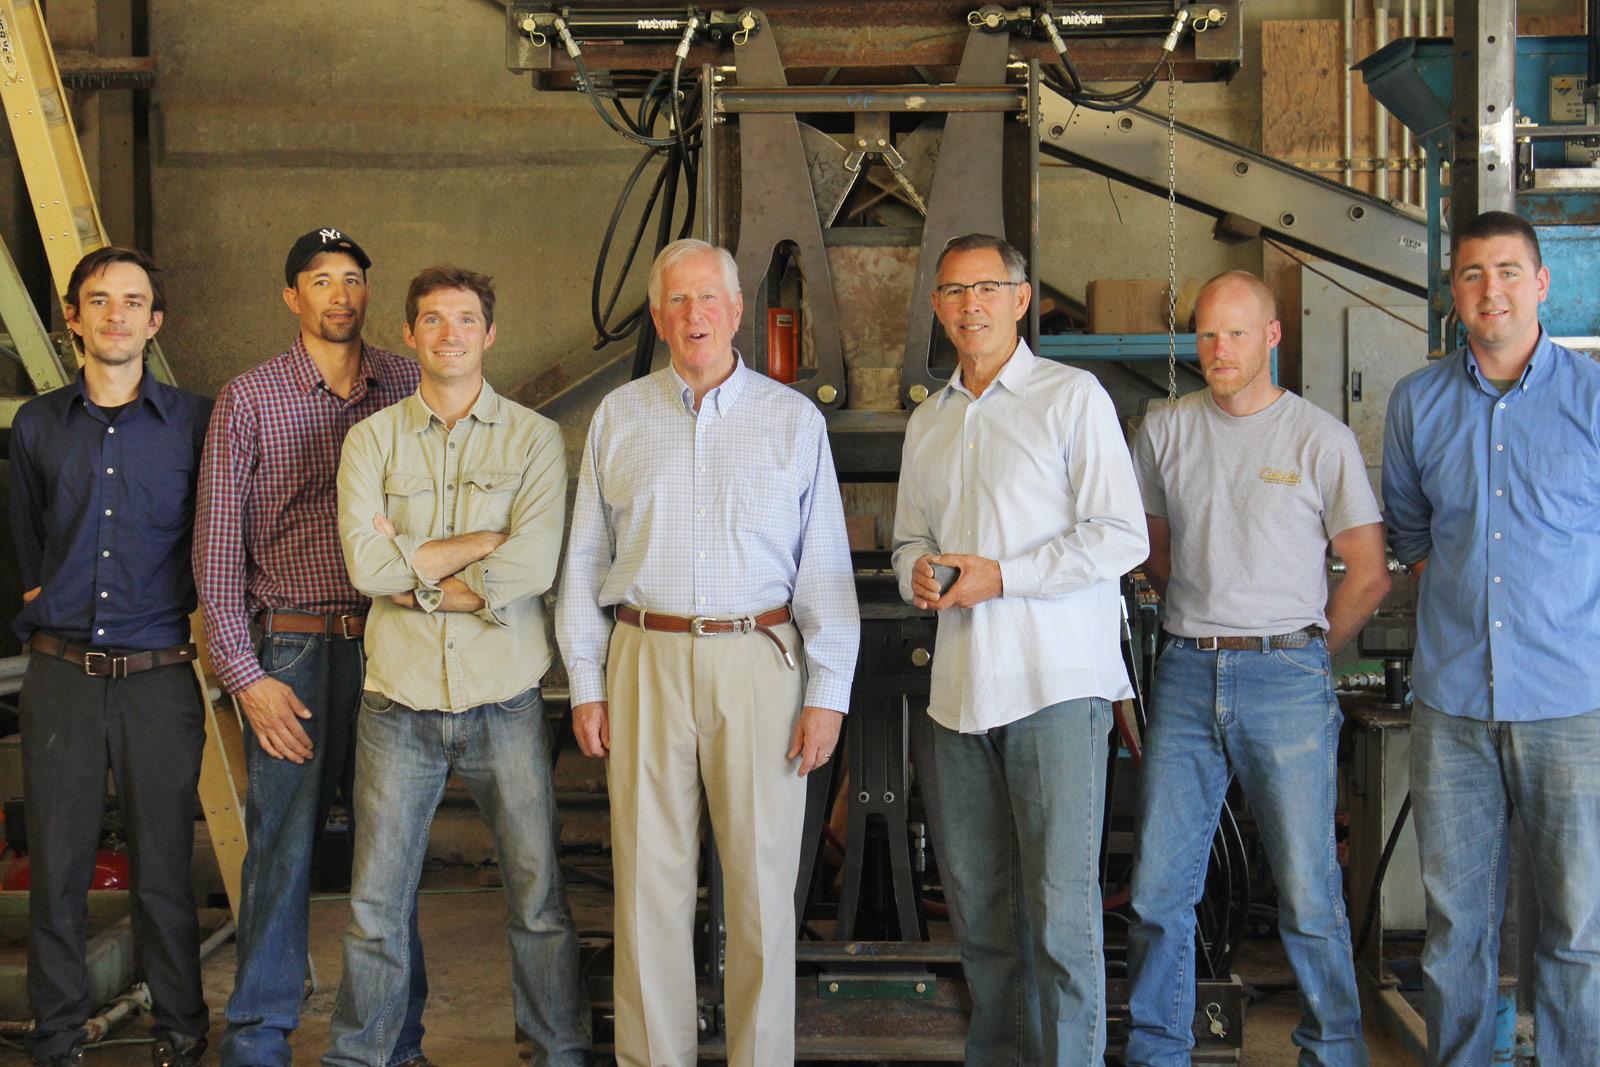 Watershed Materials team members Taj Easton, Edward De Reza, Dan Alvarado, David Easton, Mike Madison and Matthew Richardswith Congressman Mike Thompson.